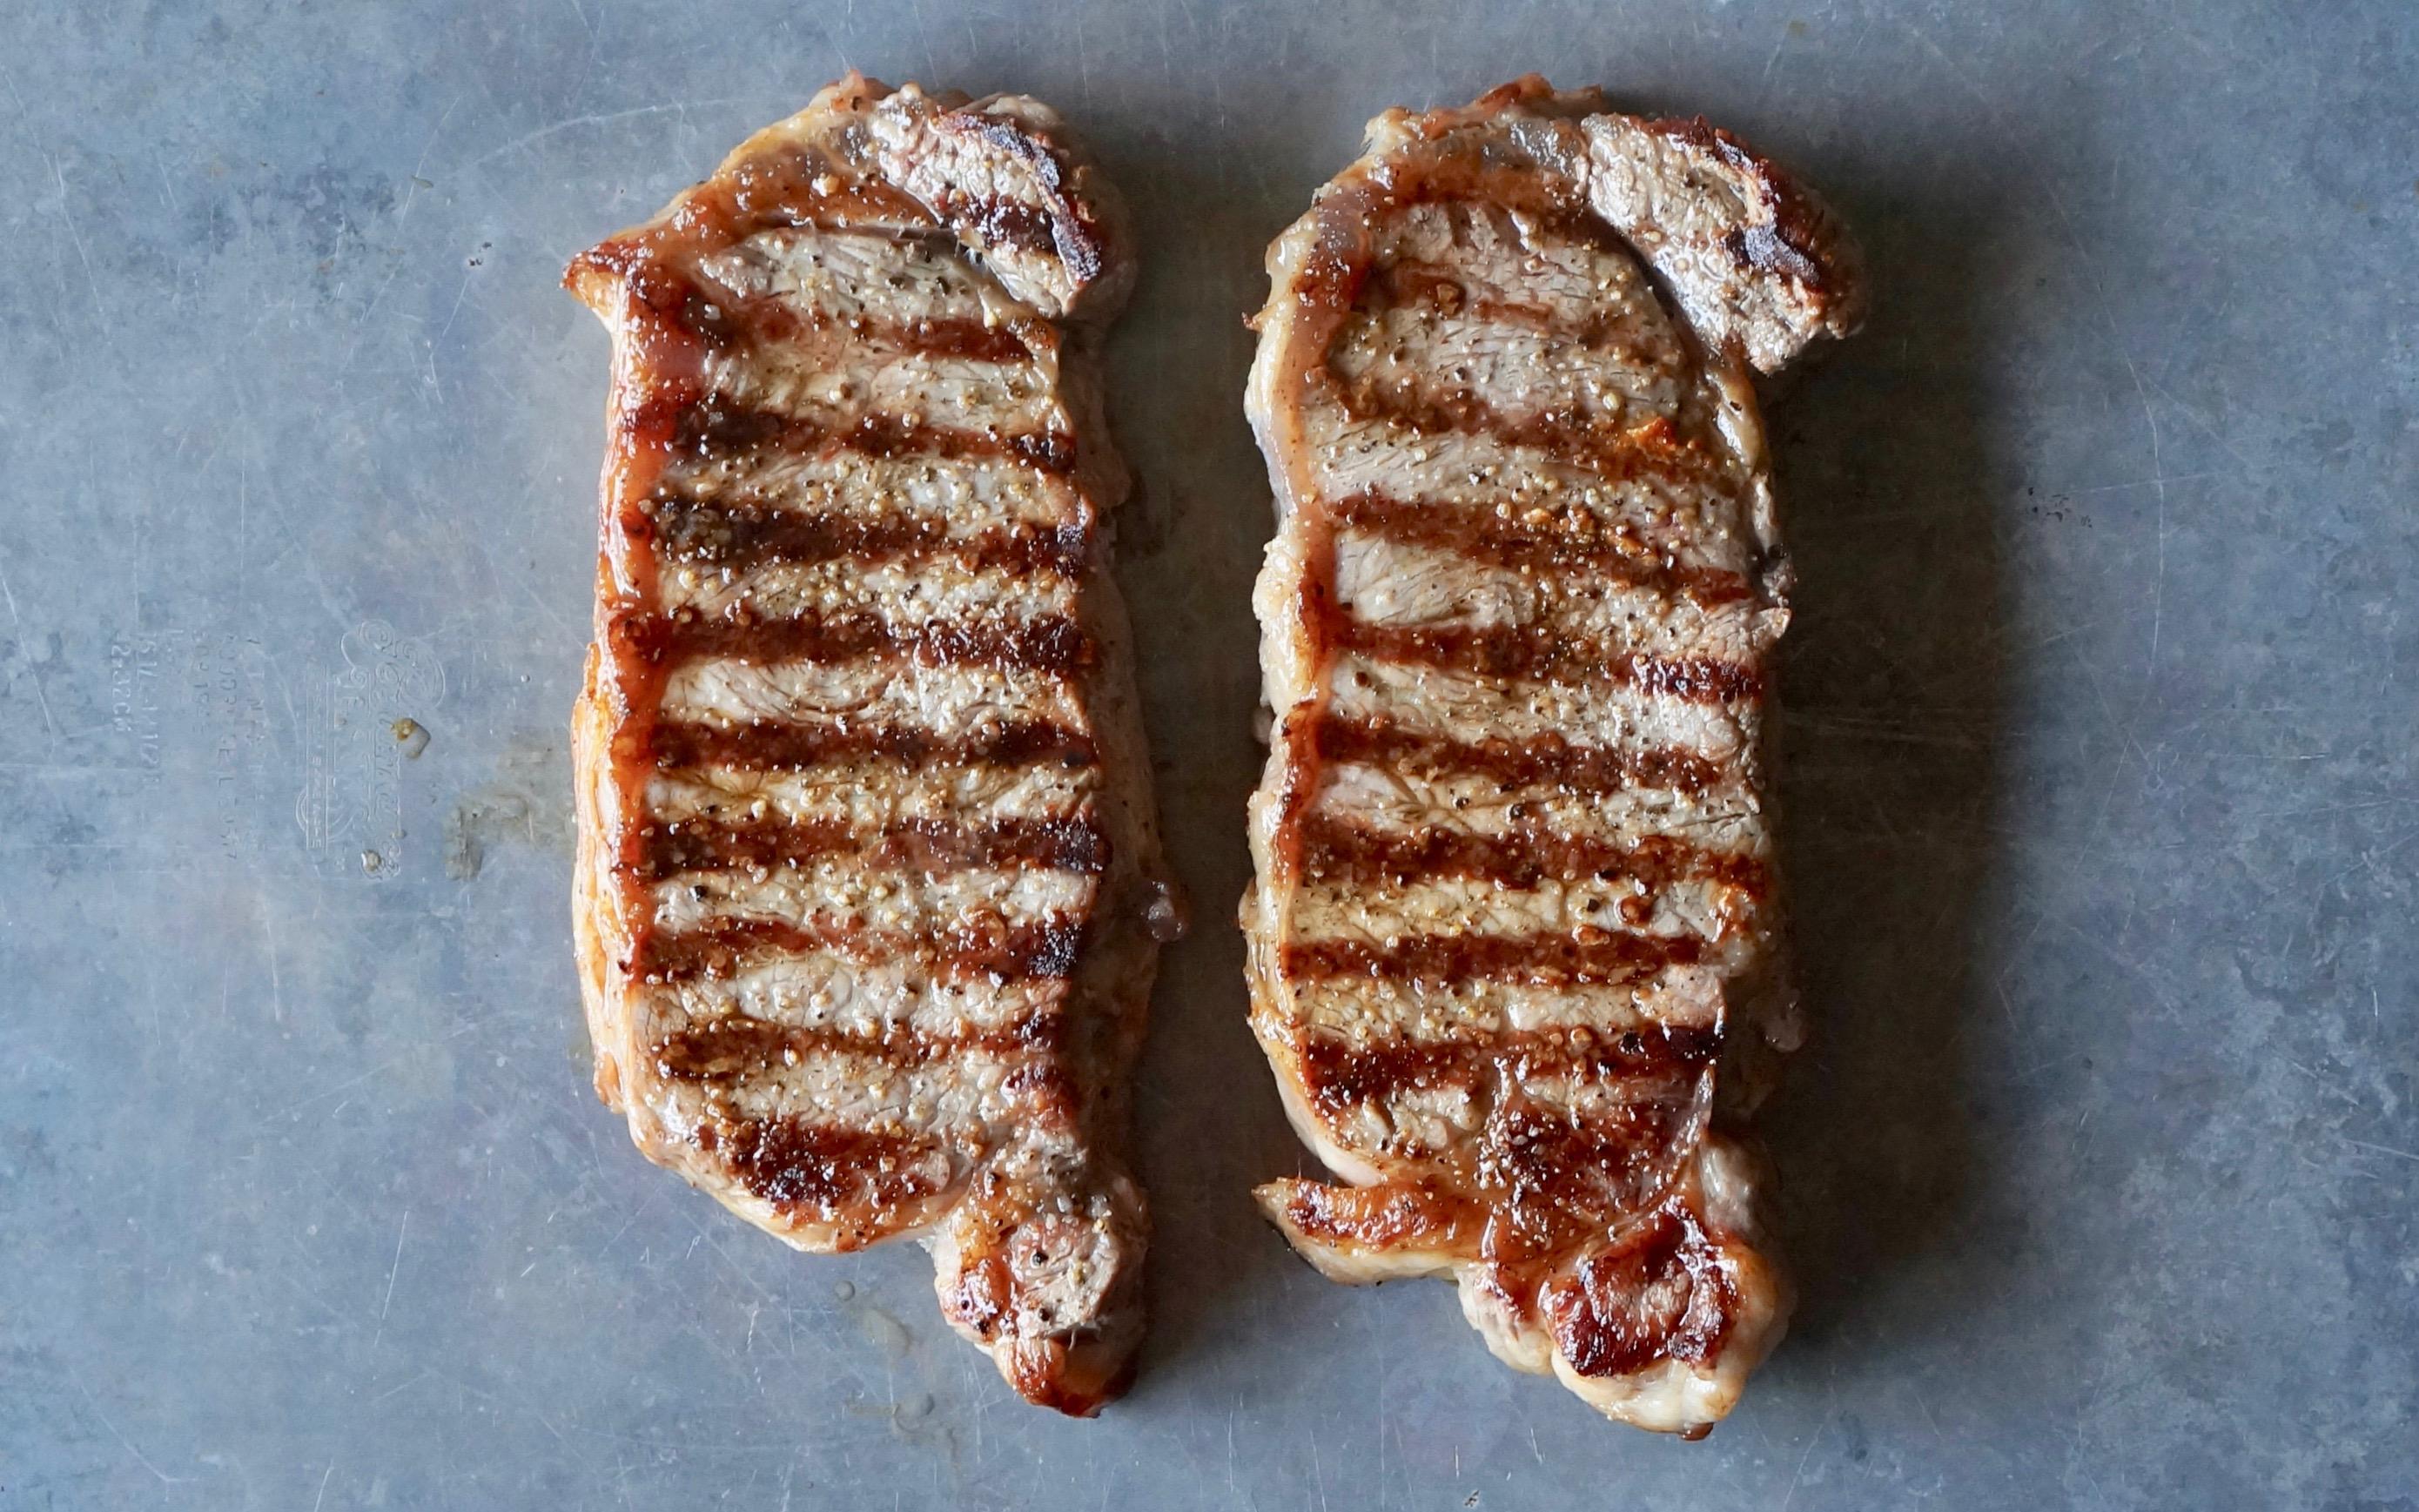 How-To-Make-Pan-Seared-New-York-Strip-Steaks-Rebecca-Gordon-Publisher-Buttermilk-Lipstick-Culinary-Entertaining-Techniques-RebeccaGordon-Southern-Hostess-Pastry-Chef-Birmingham-Alabama